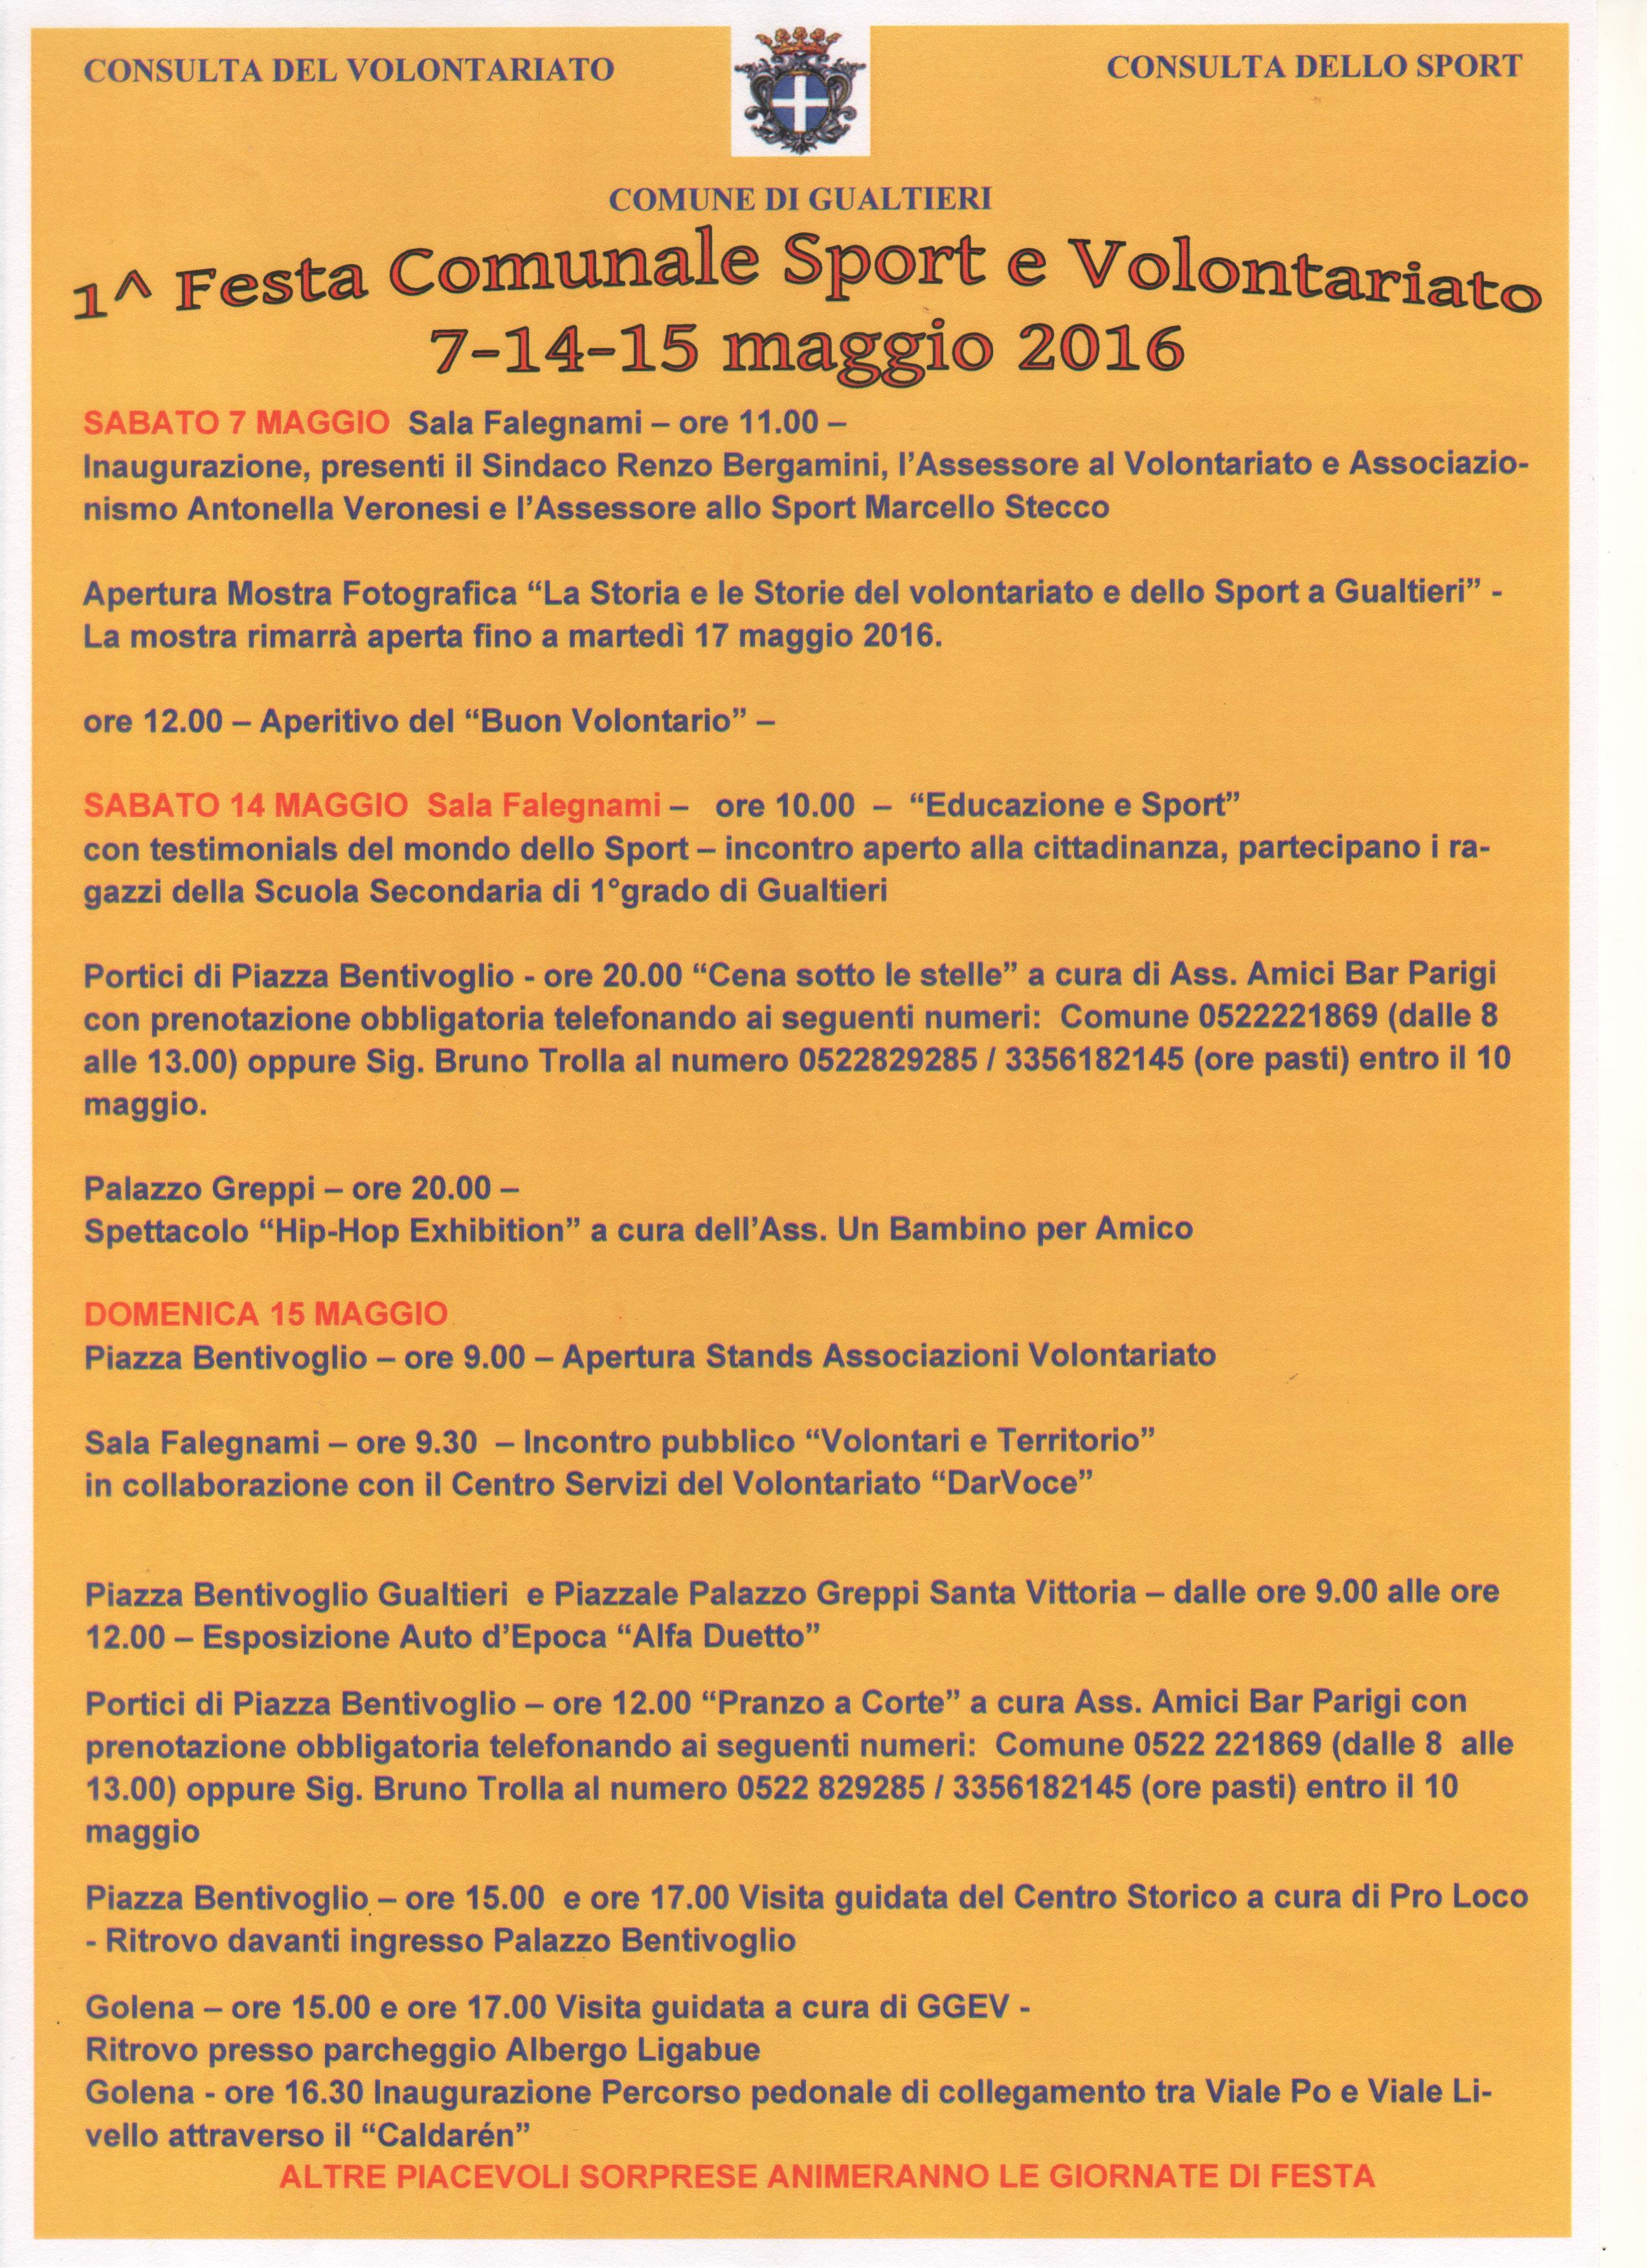 ProLoco, festa, volontariato, Gualtieri 001